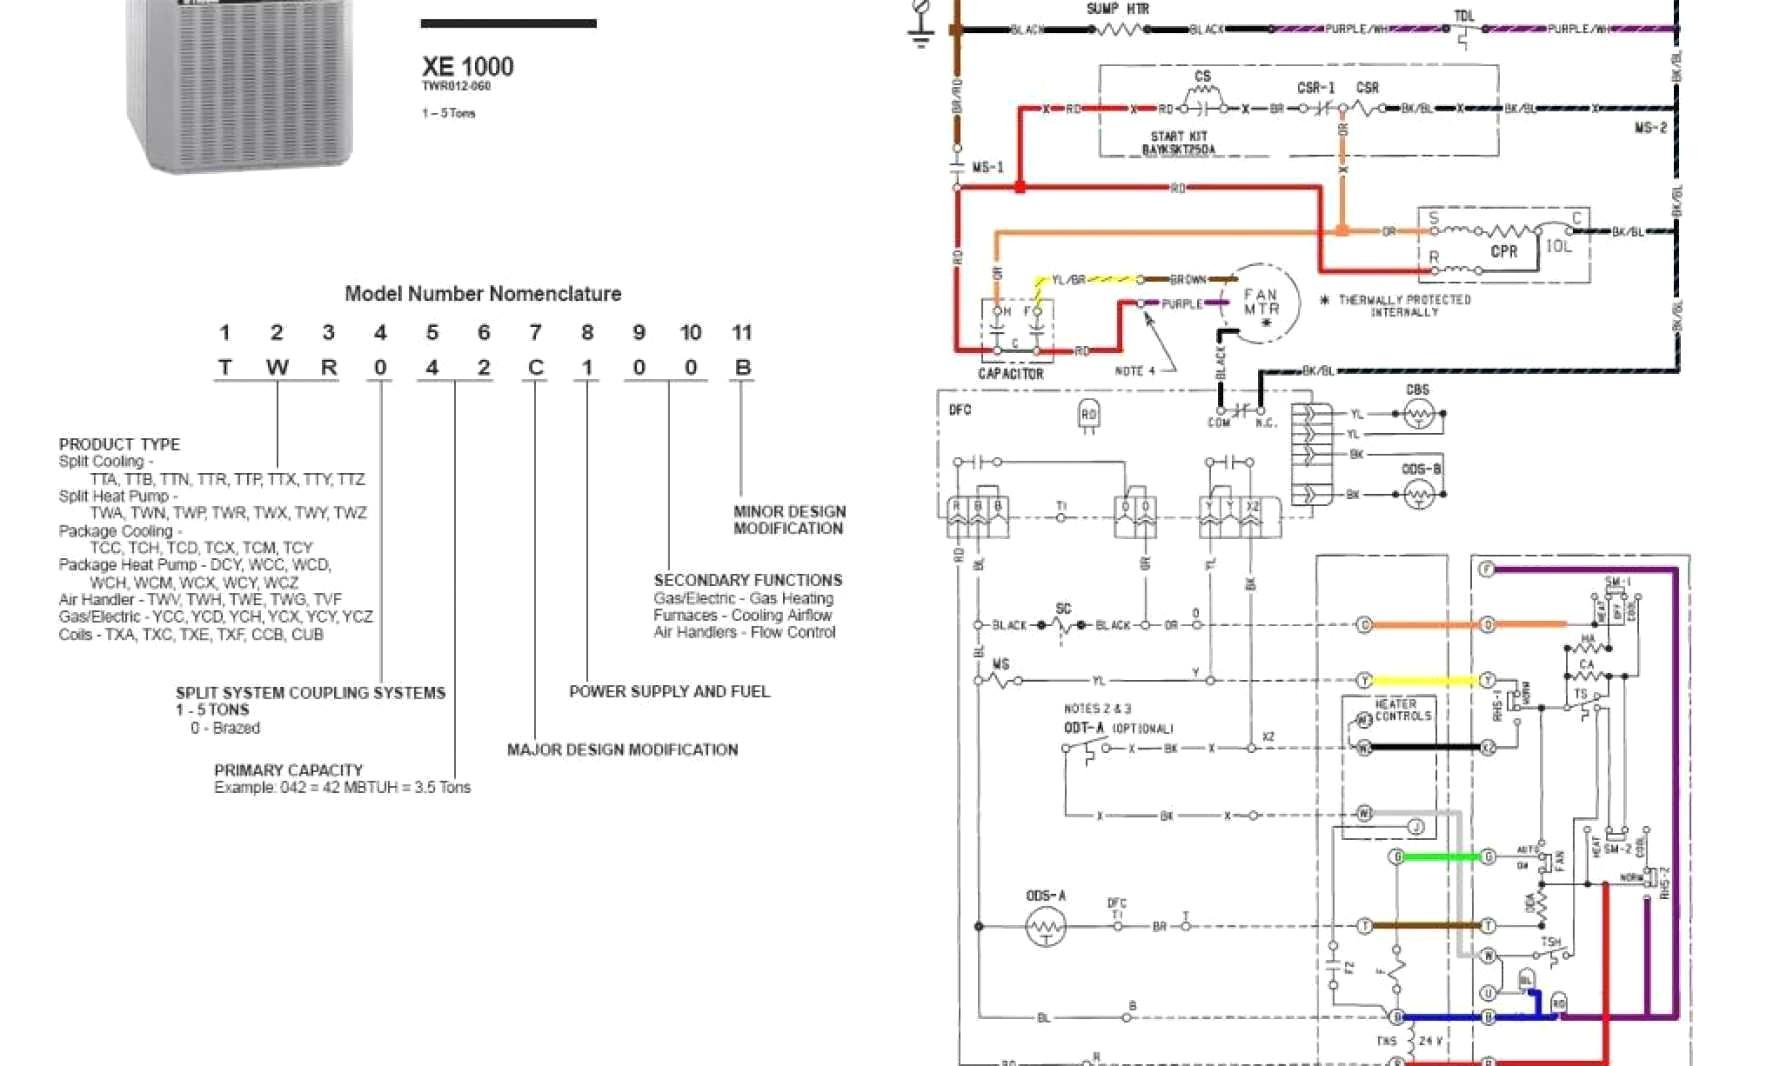 7 wire wiring diagram trane xr401 great installation of wiring 7 wire wiring diagram trane xr401 images gallery